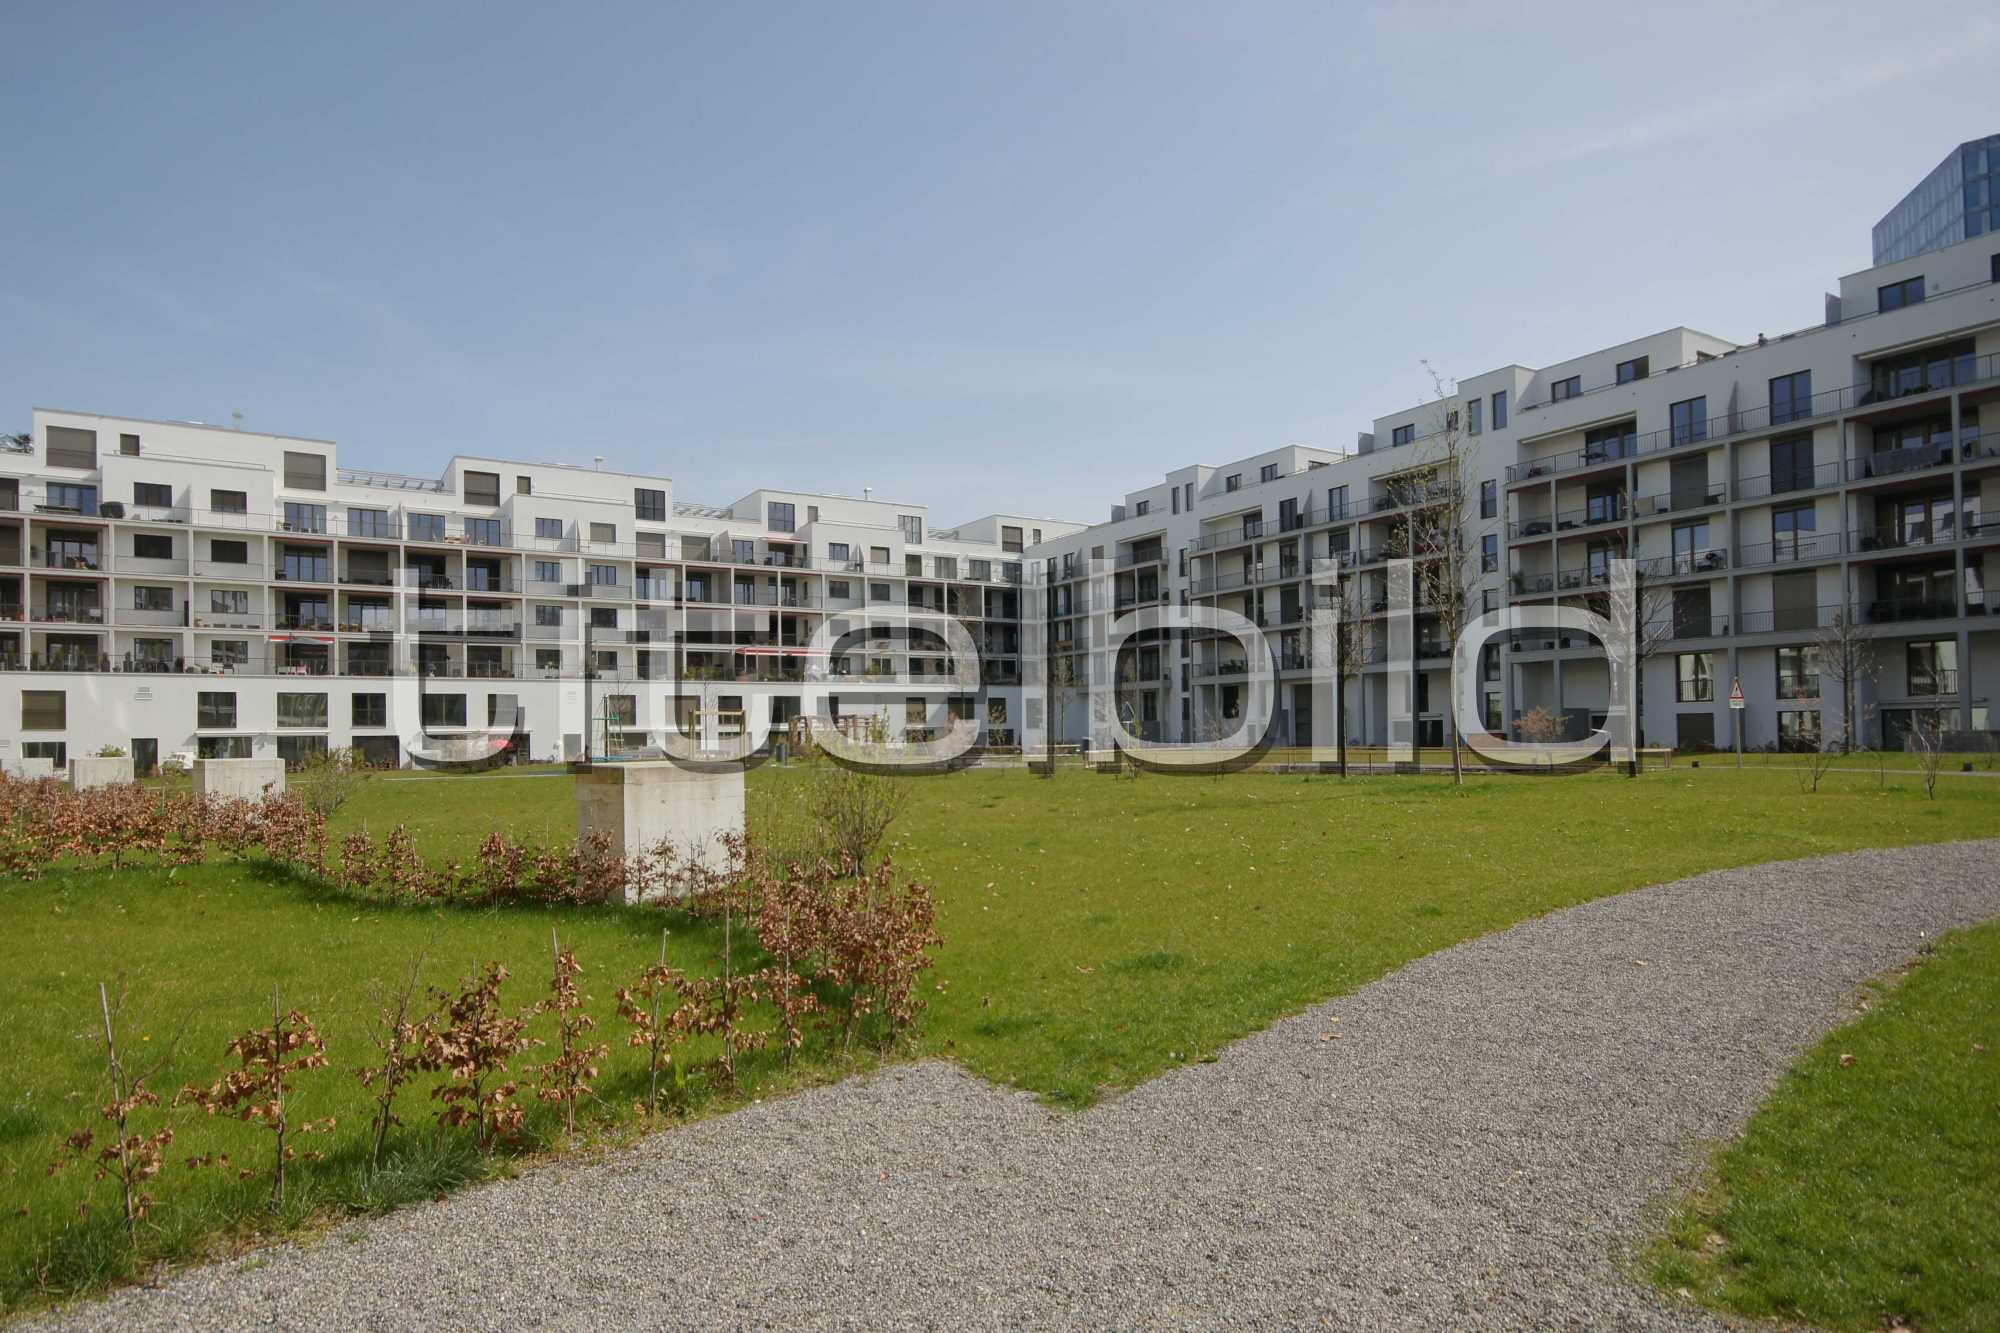 Projektbild-Nr. 7: Richti Areal Konradhof, Baufeld 1/7